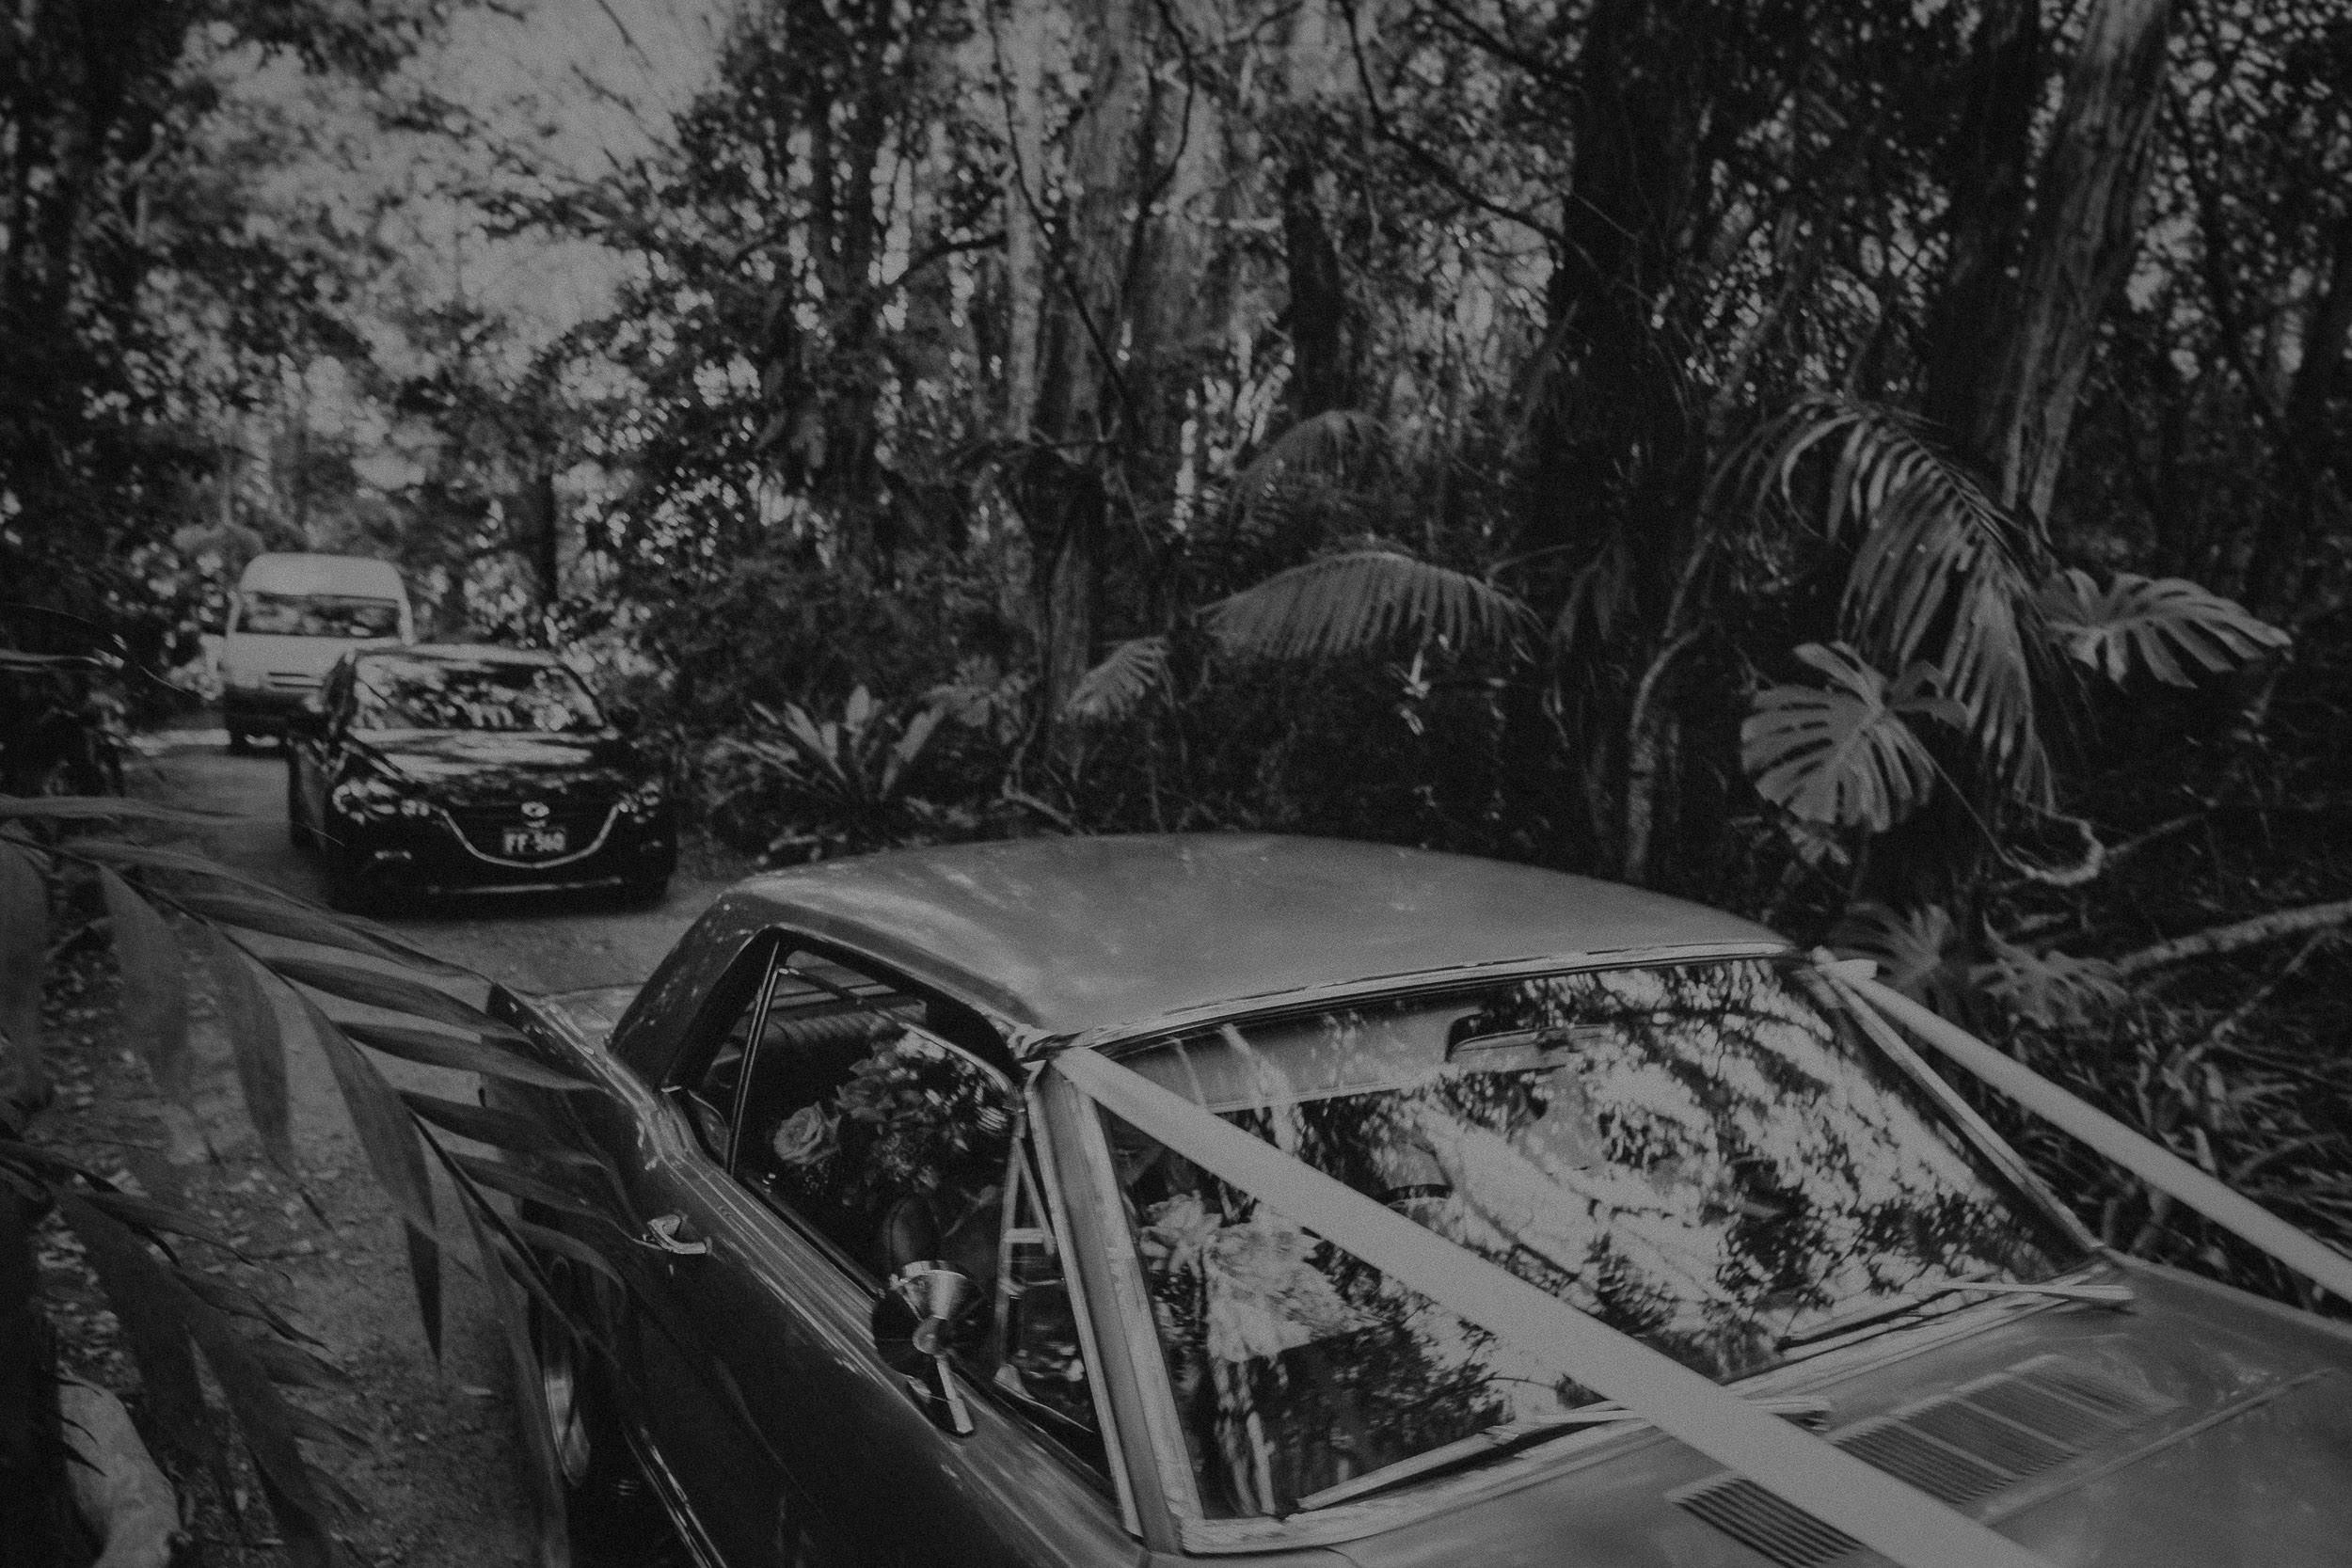 S&A Elopement - Kings & Thieves - Shred 'Til Dead - Central Coast Beach Forest Wedding - 142.jpg